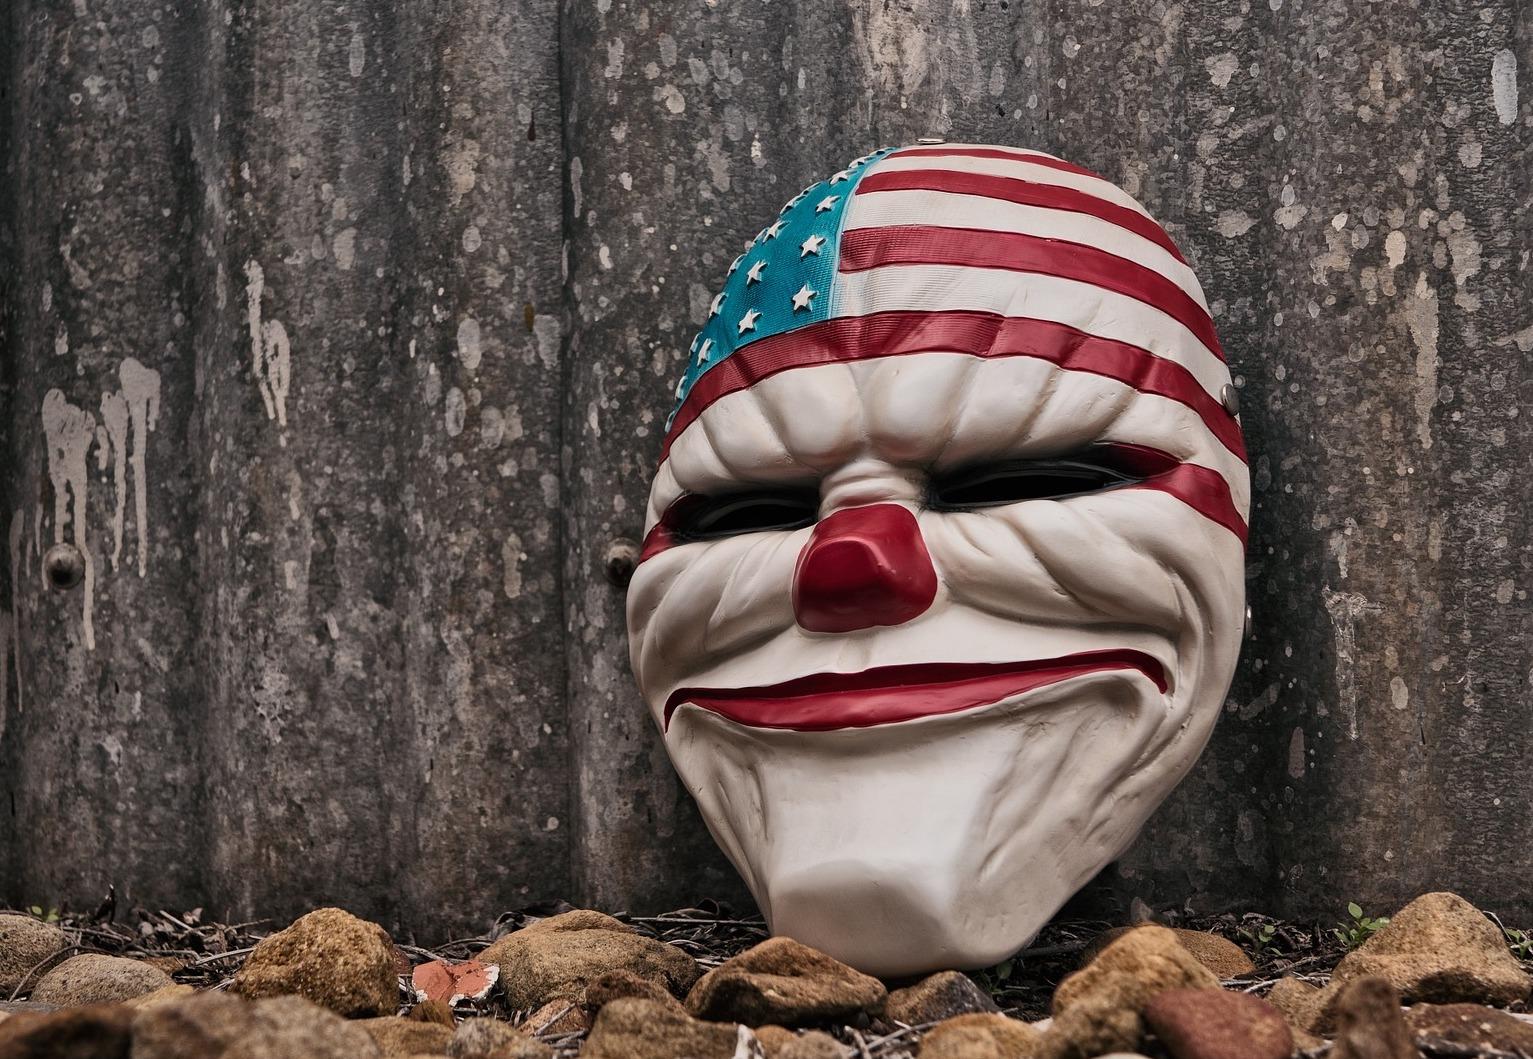 USA clown mask